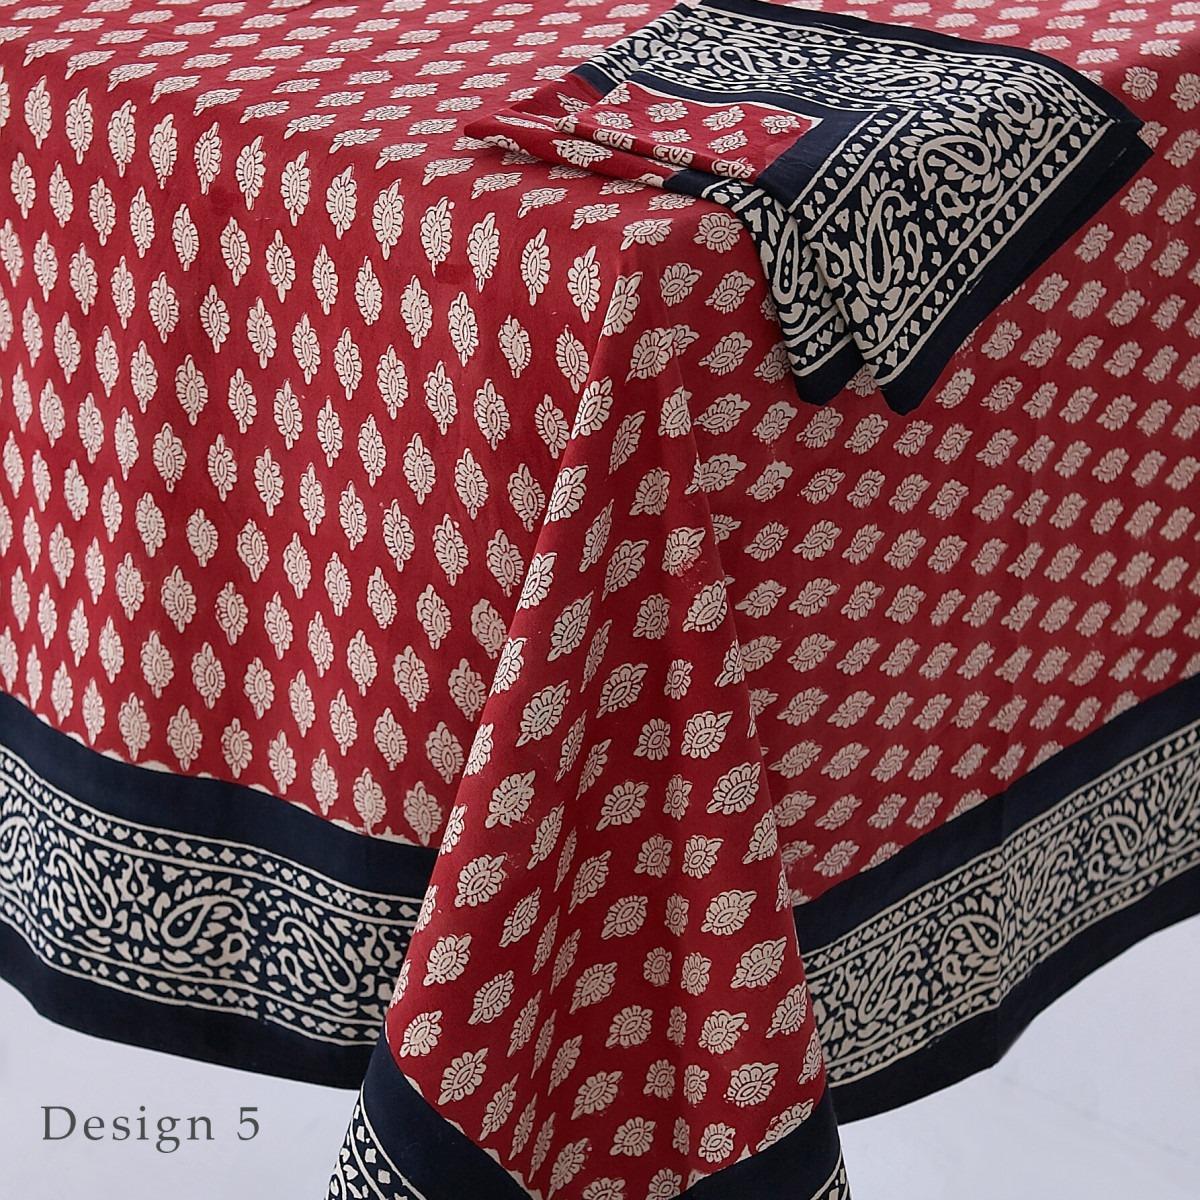 Block Printed Tablecloth Design 5